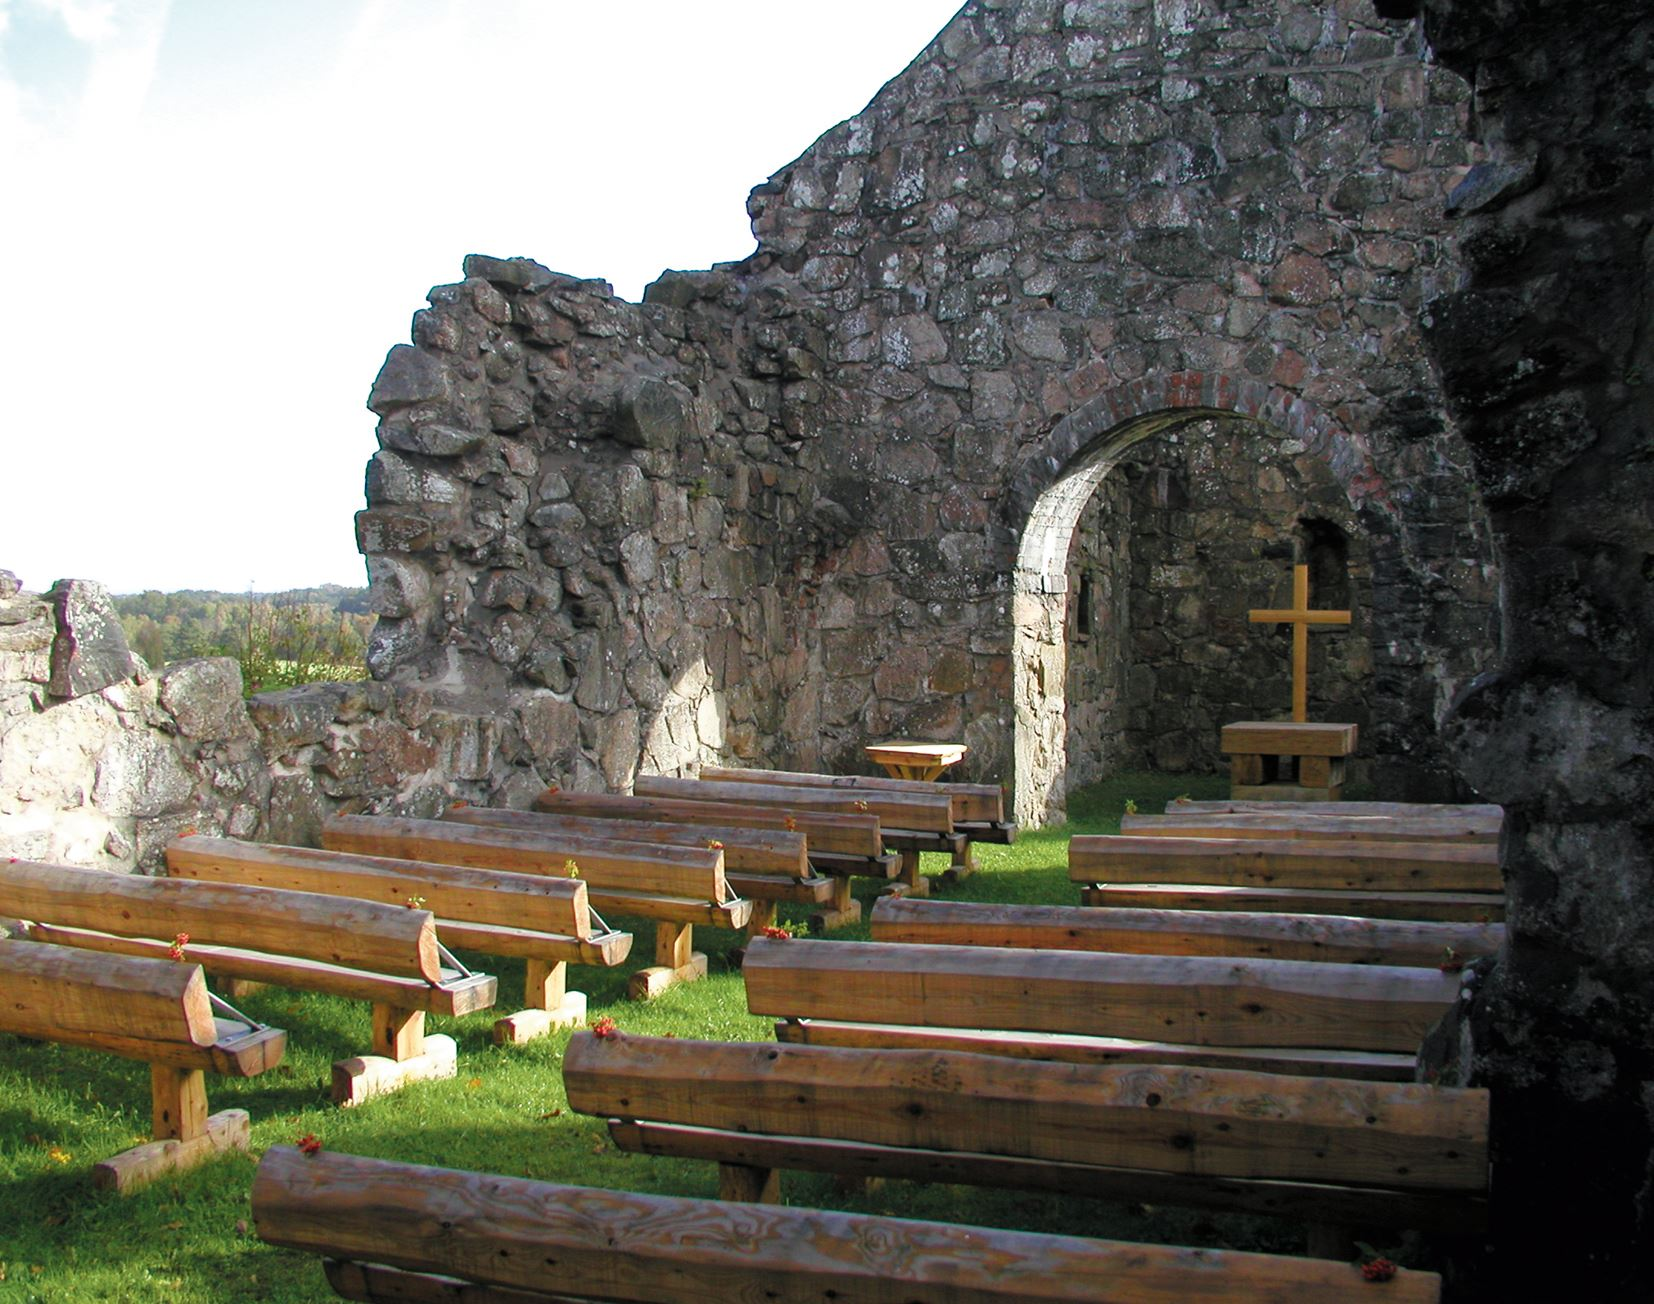 Rya kirkeruin - Rya kyrkoruin (Rya gamla kyrka)